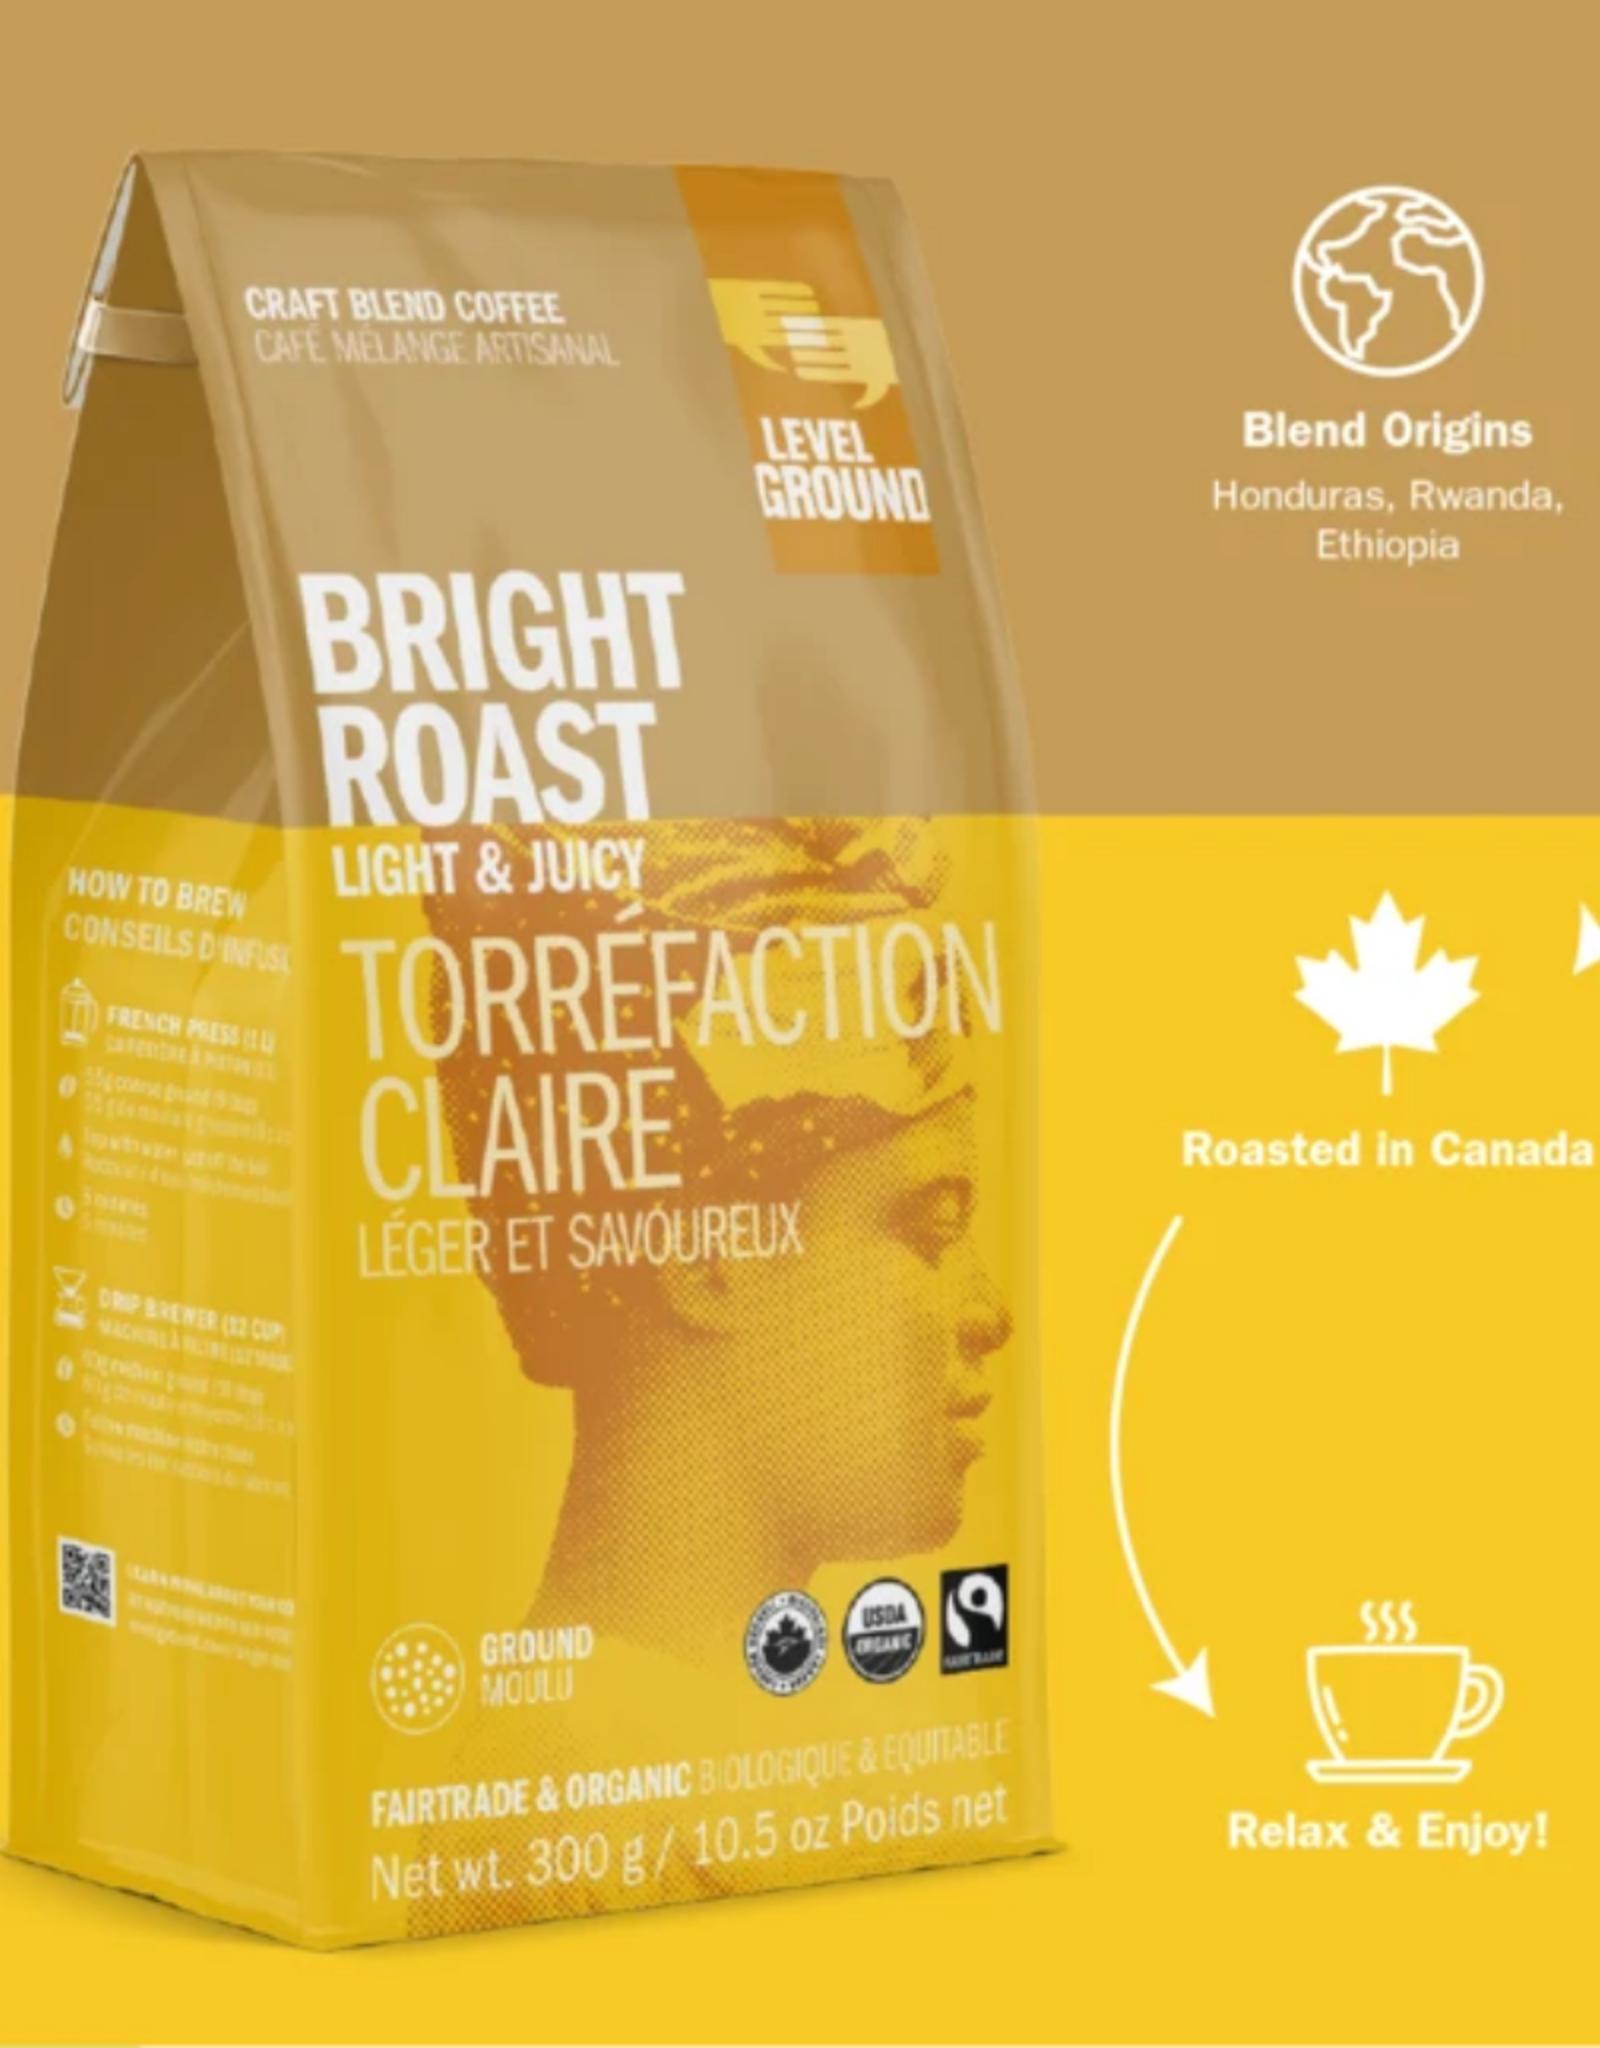 Level Ground Coffee, Bright Roast Light & Juicy, Ground 300g